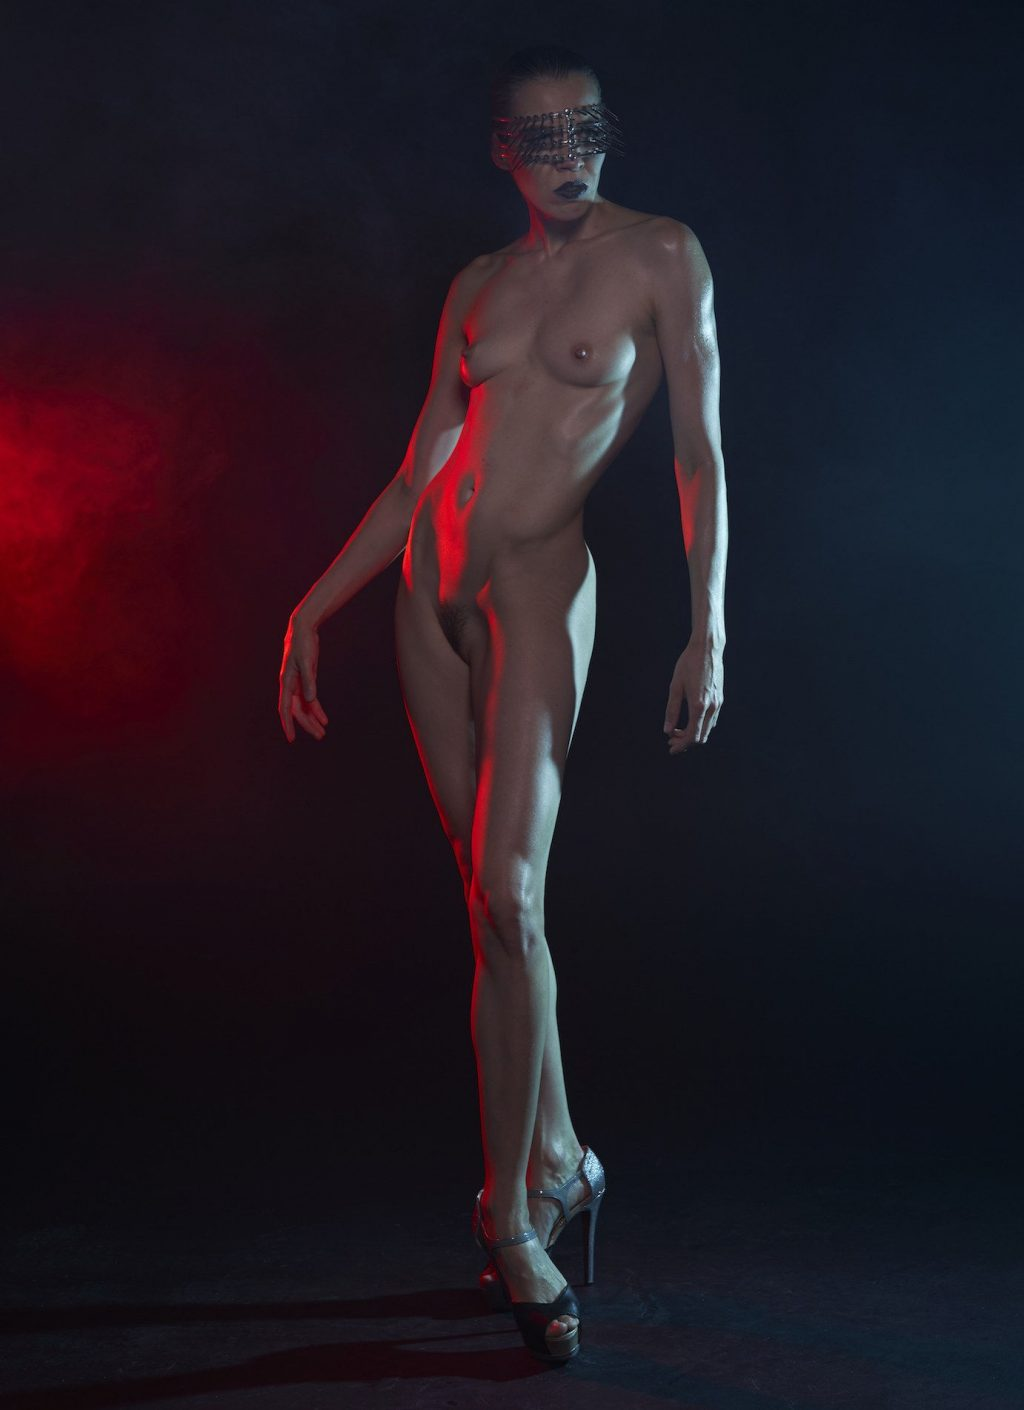 nude (34 photo), Instagram Celebrites image